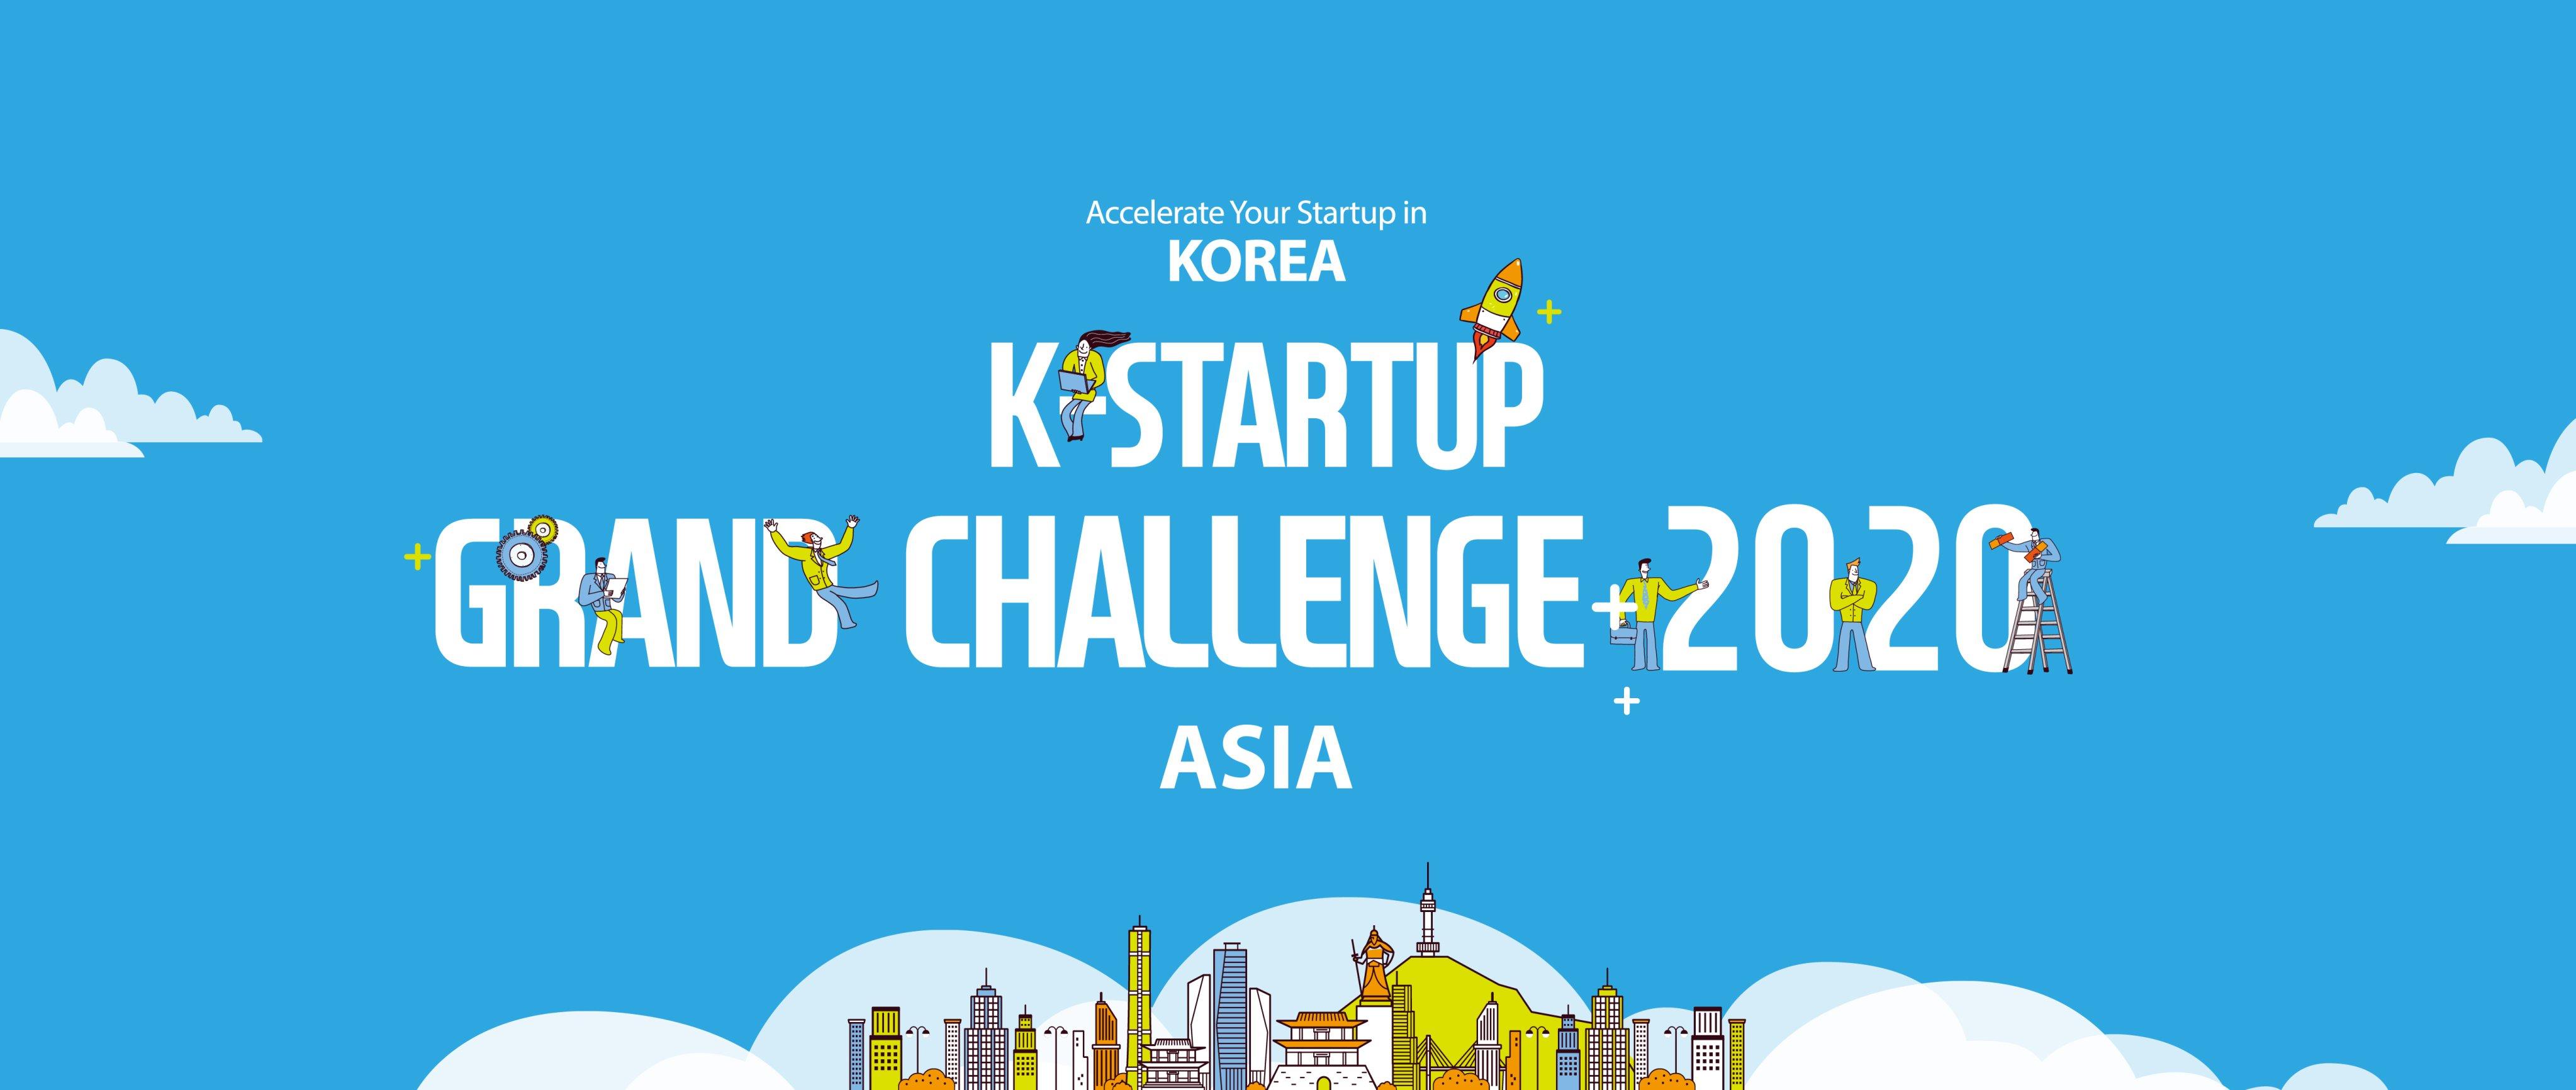 K-Startup Grand Challenge 2020